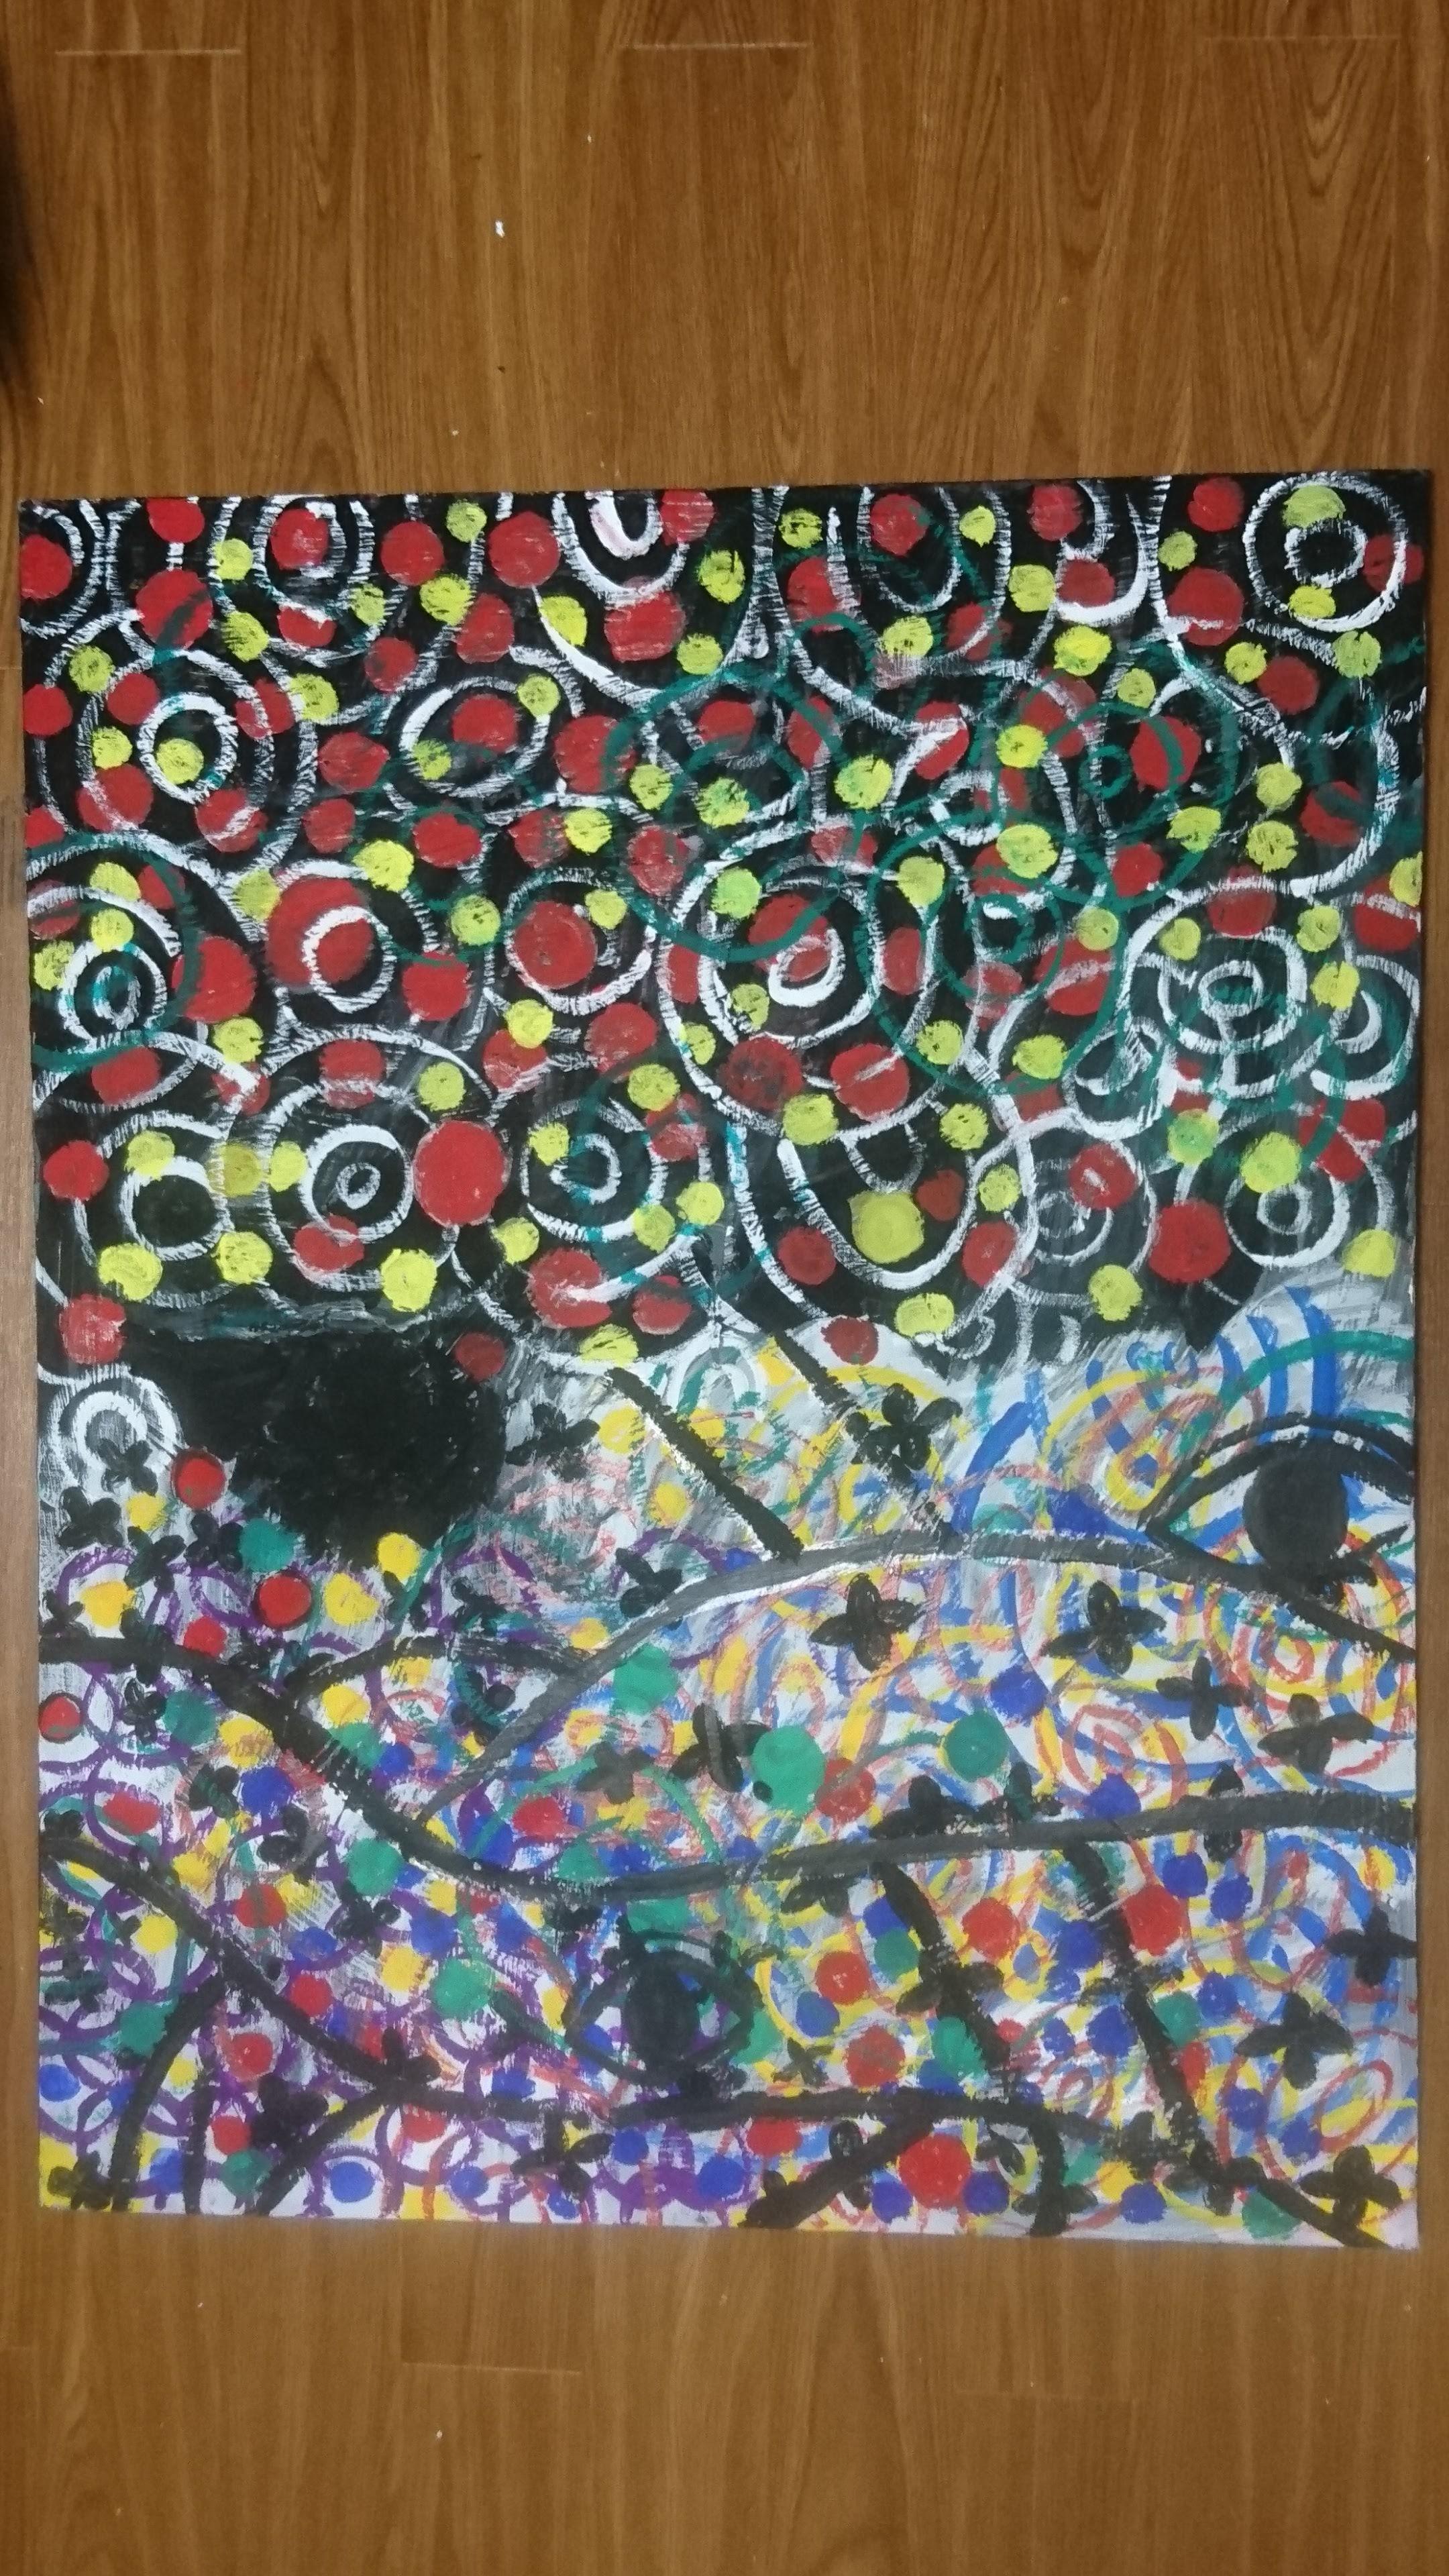 while stardusts are still seen : Yoko's drawing / 2017/12/01 - 2017/12/02 / 天に星が残っているうちに : 伊藤 洋子の絵